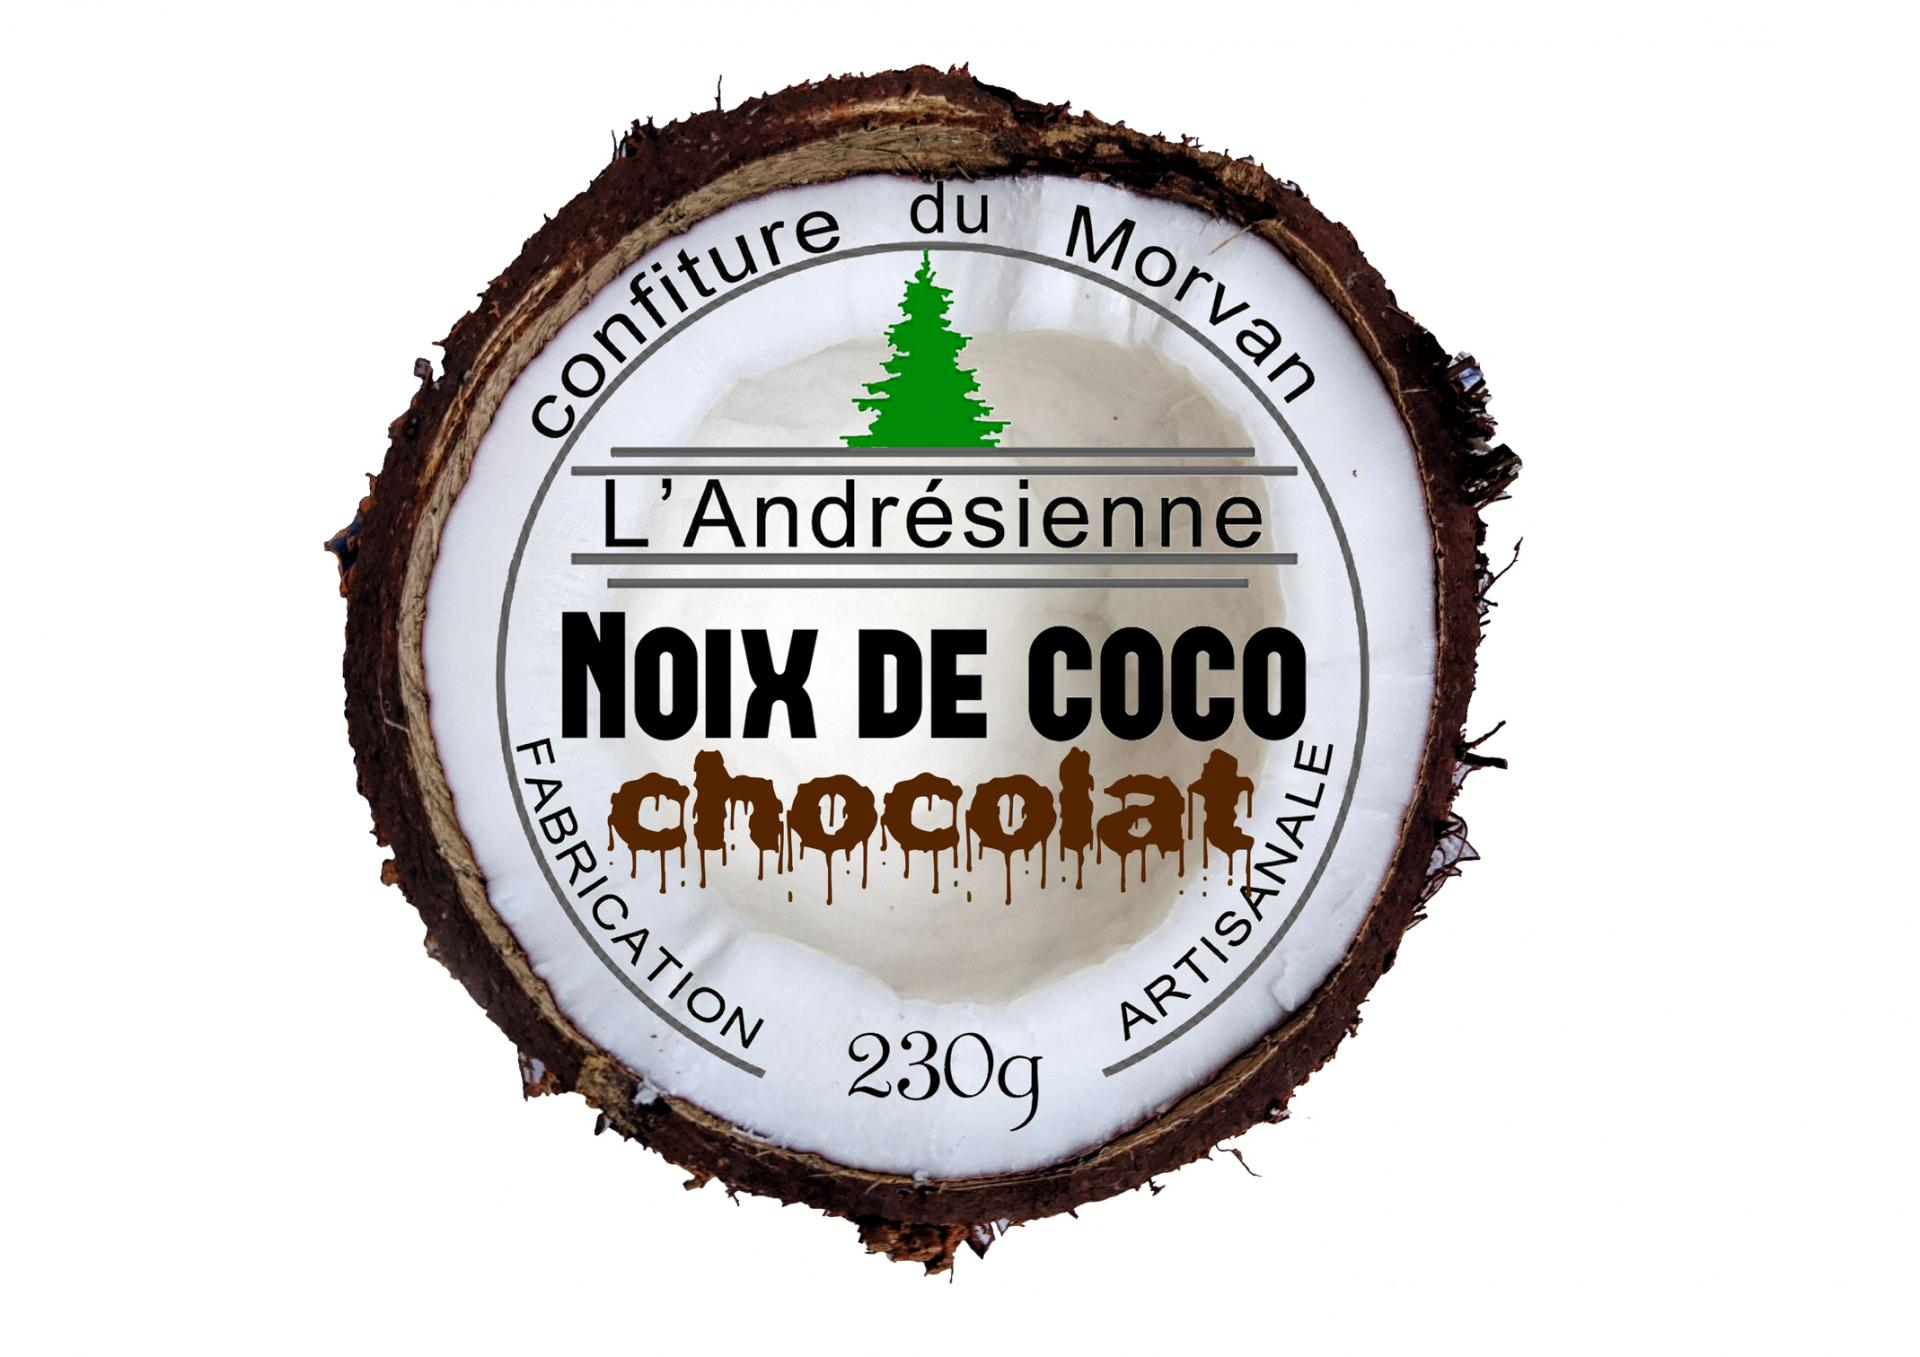 Noix de coco chocolat